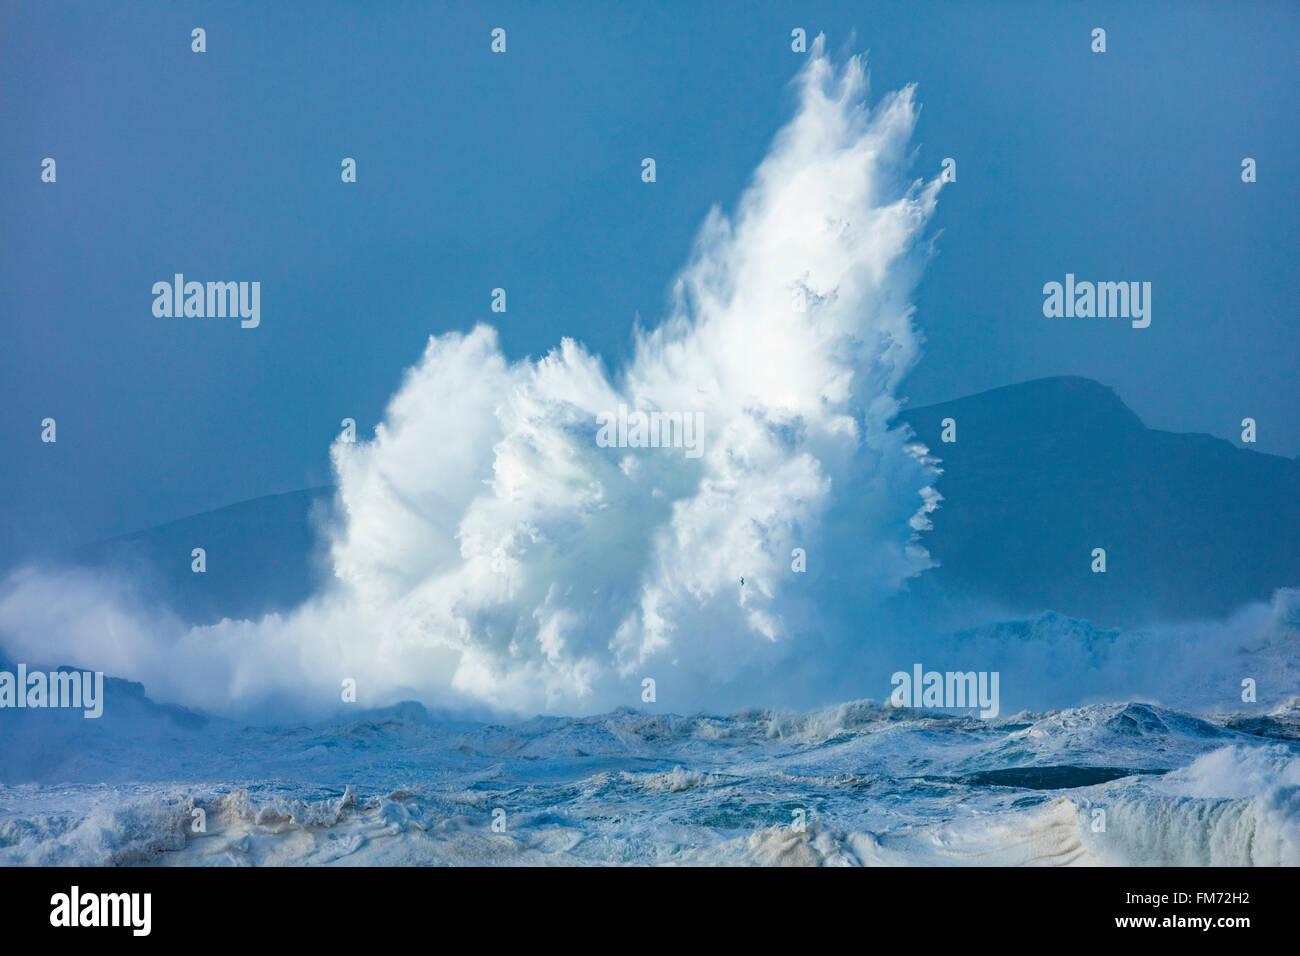 Sturmwellen in der Nähe von Clogher Head, Halbinsel Dingle, County Kerry, Irland. Stockbild